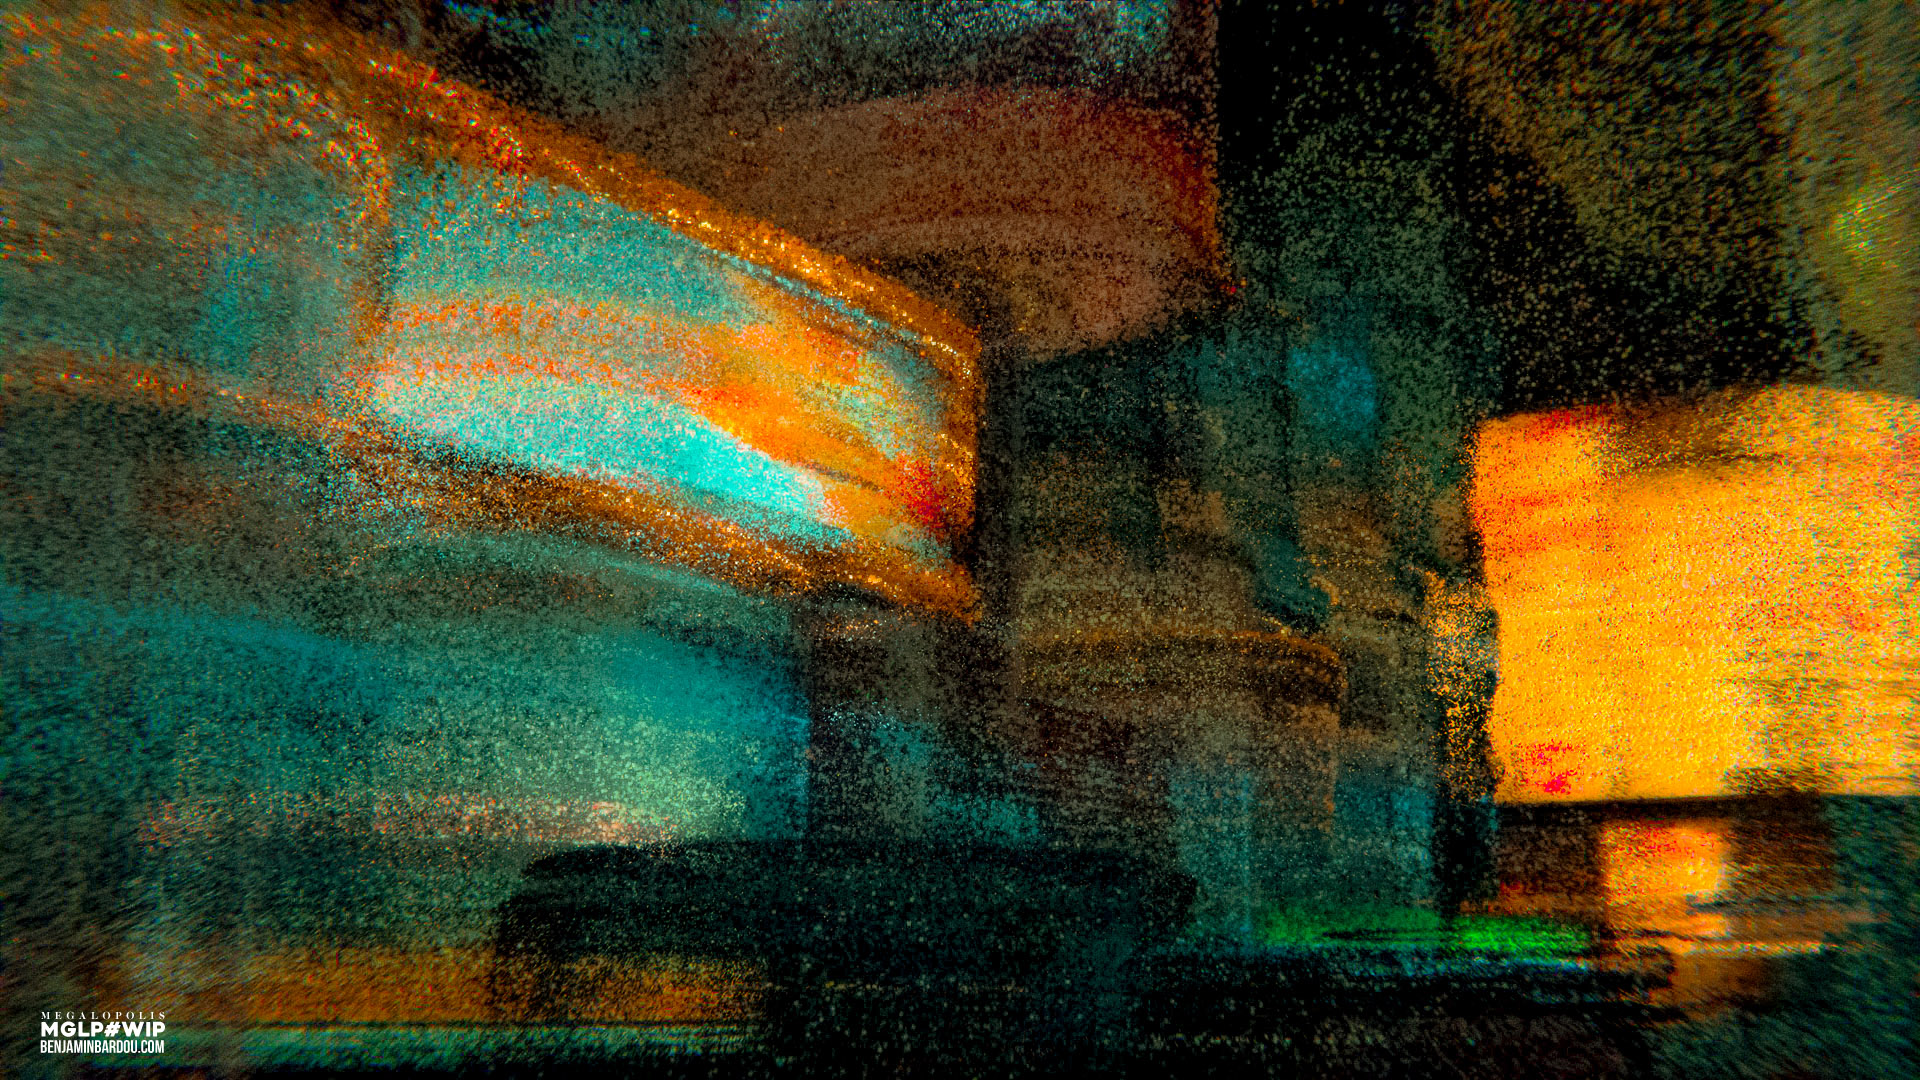 micropolis_SydMead_003